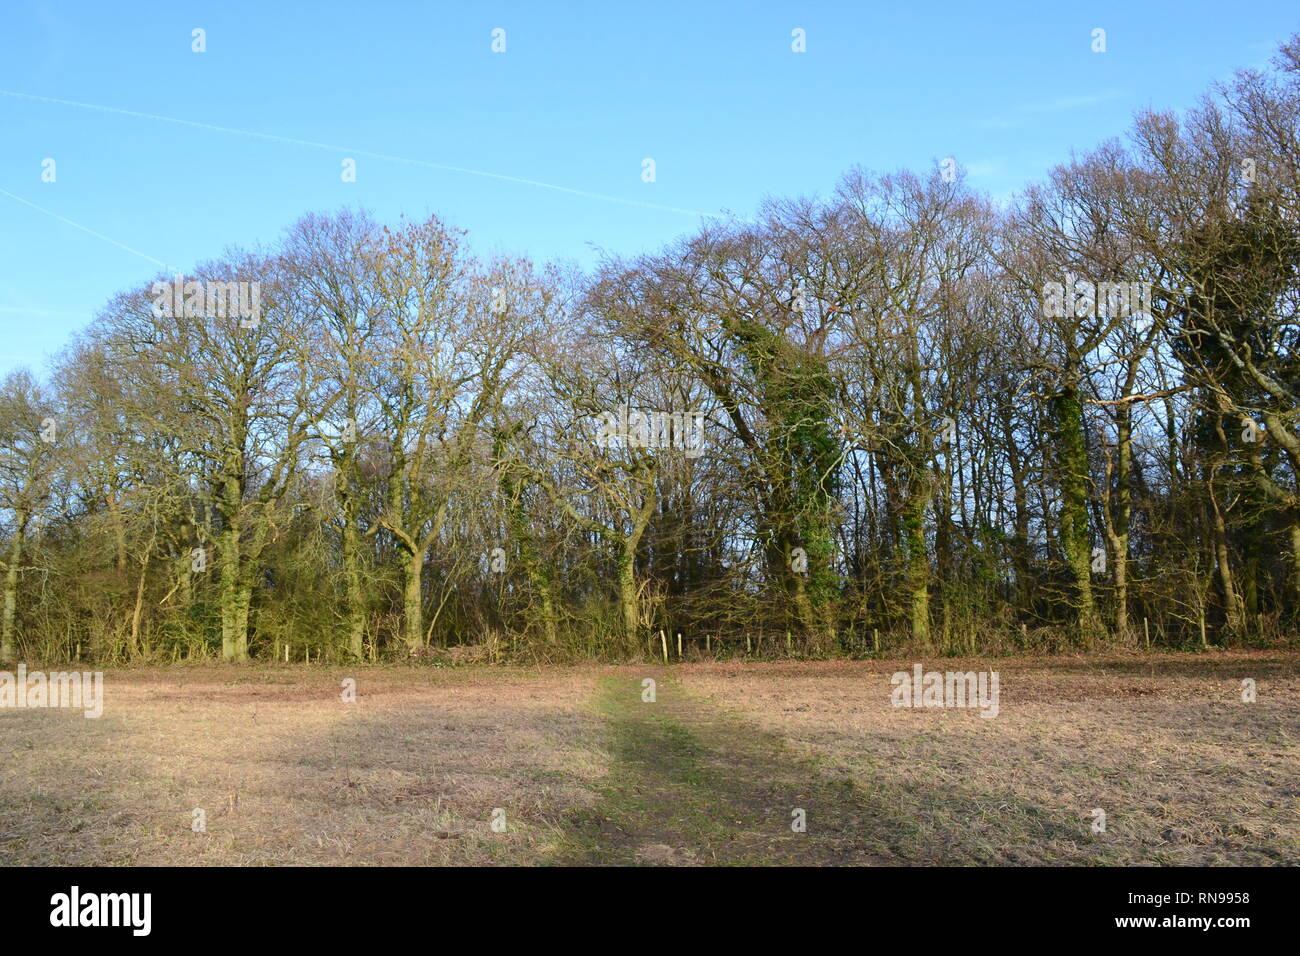 Austin Spring wood near Romney Street, Kent on a strangely warm February day. Popular walking route between Shoreham, Eynsford or Otford and Sevenoaks - Stock Image